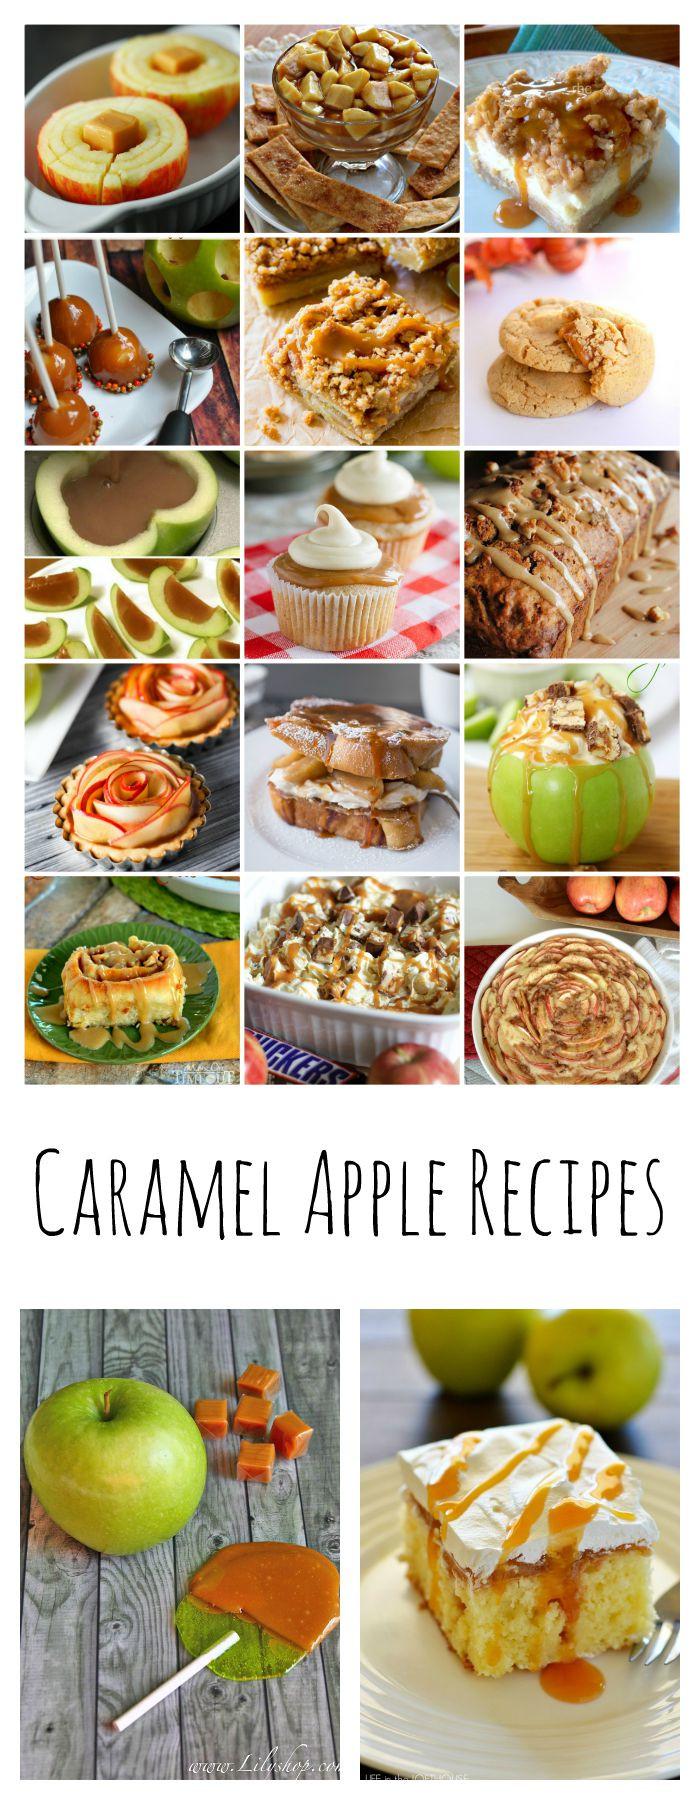 Fall Apple Recipes  Caramel Apple Recipes The Idea Room